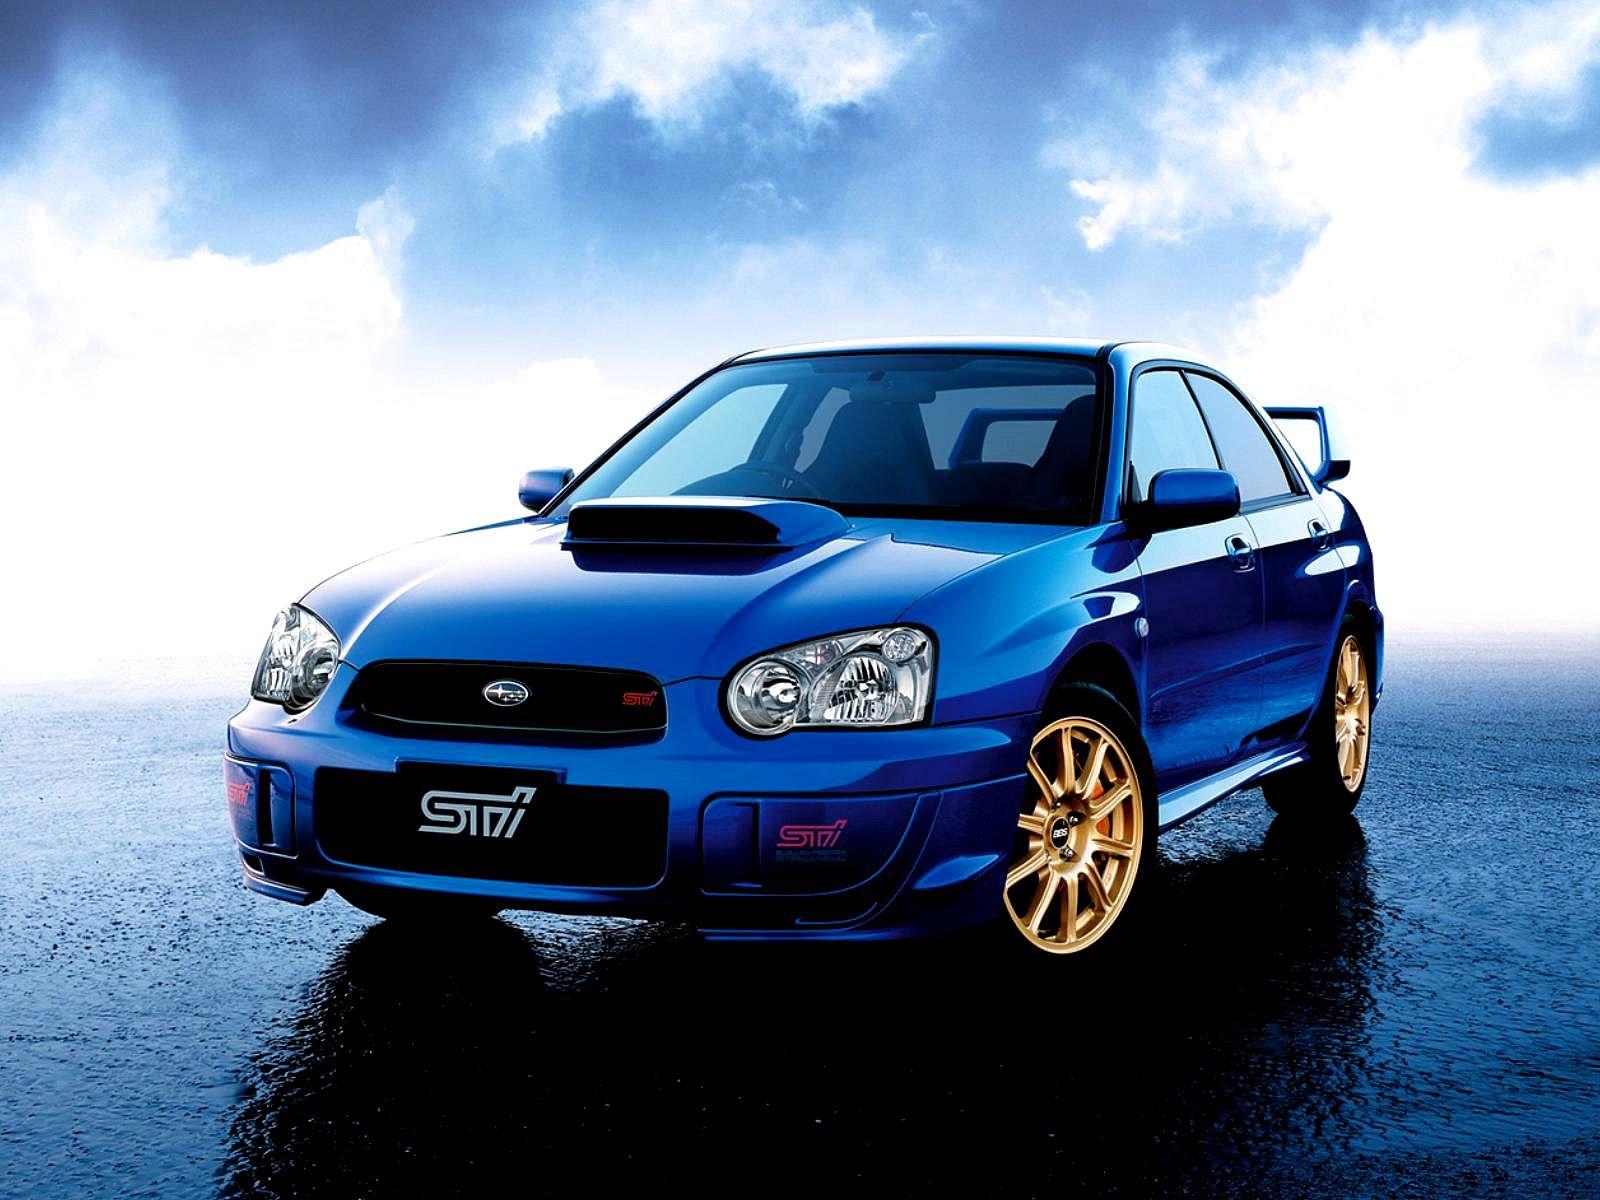 Subaru impreza wallpapers hd wallpapers base impreza wrx when 2004 rolled around subaru finally shipped the wrx sti to north america vanachro Choice Image